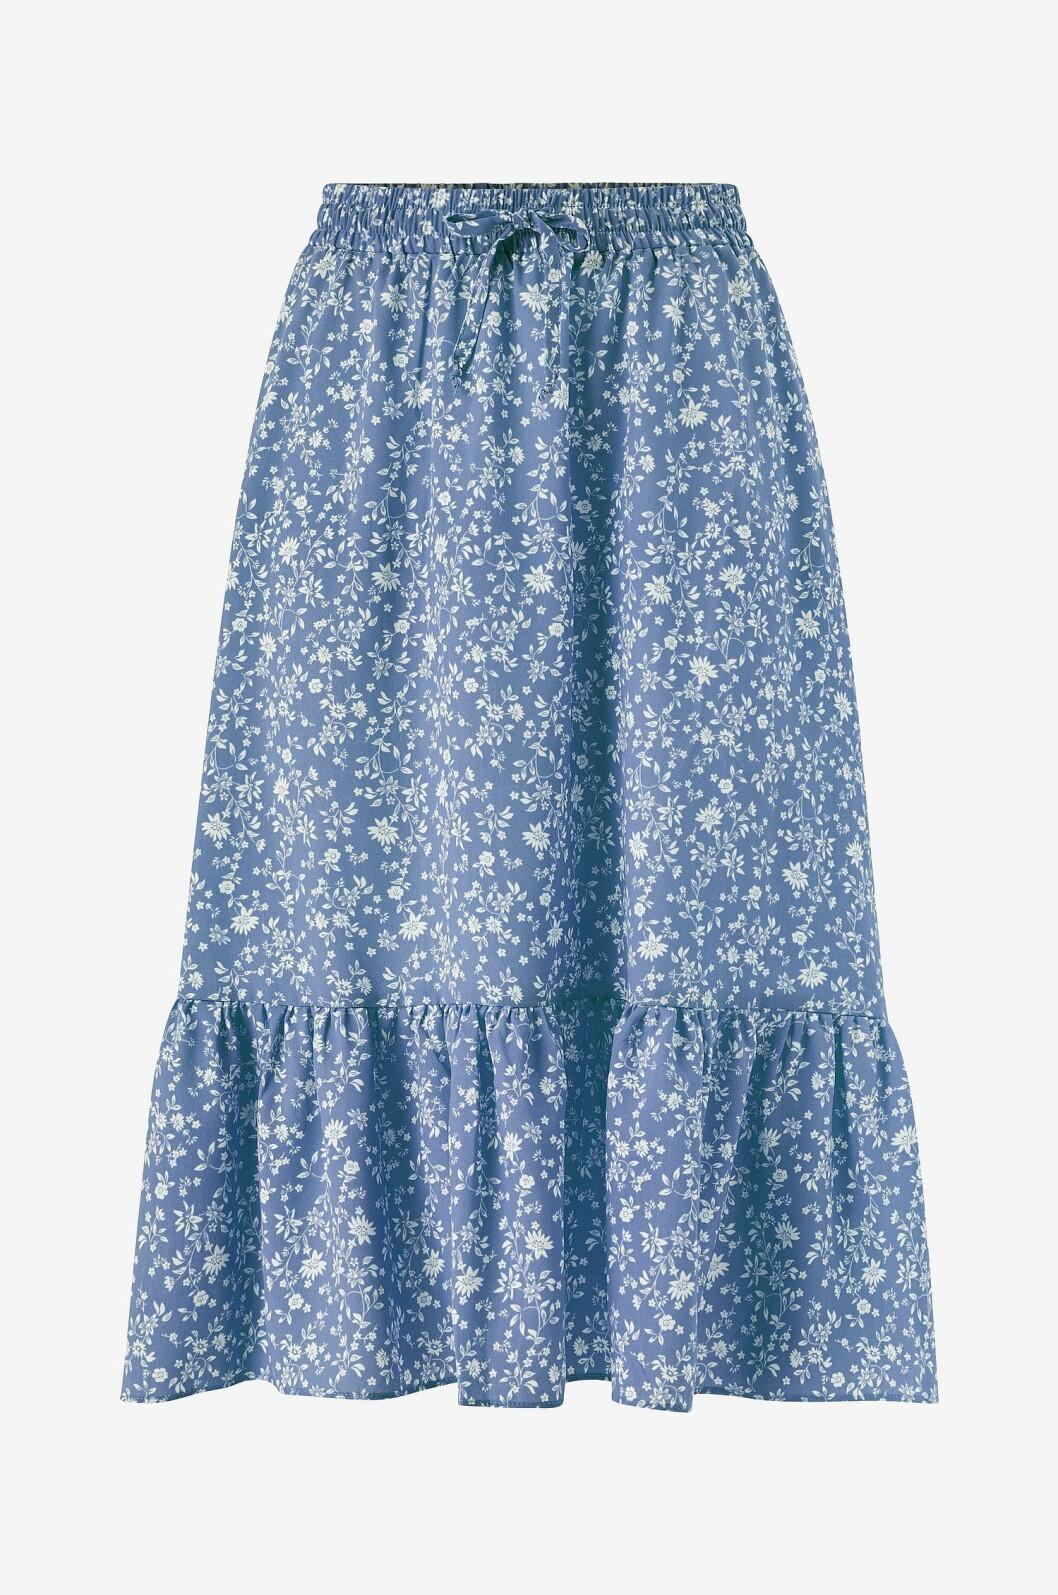 Blå volangkjol med blommor till 2020